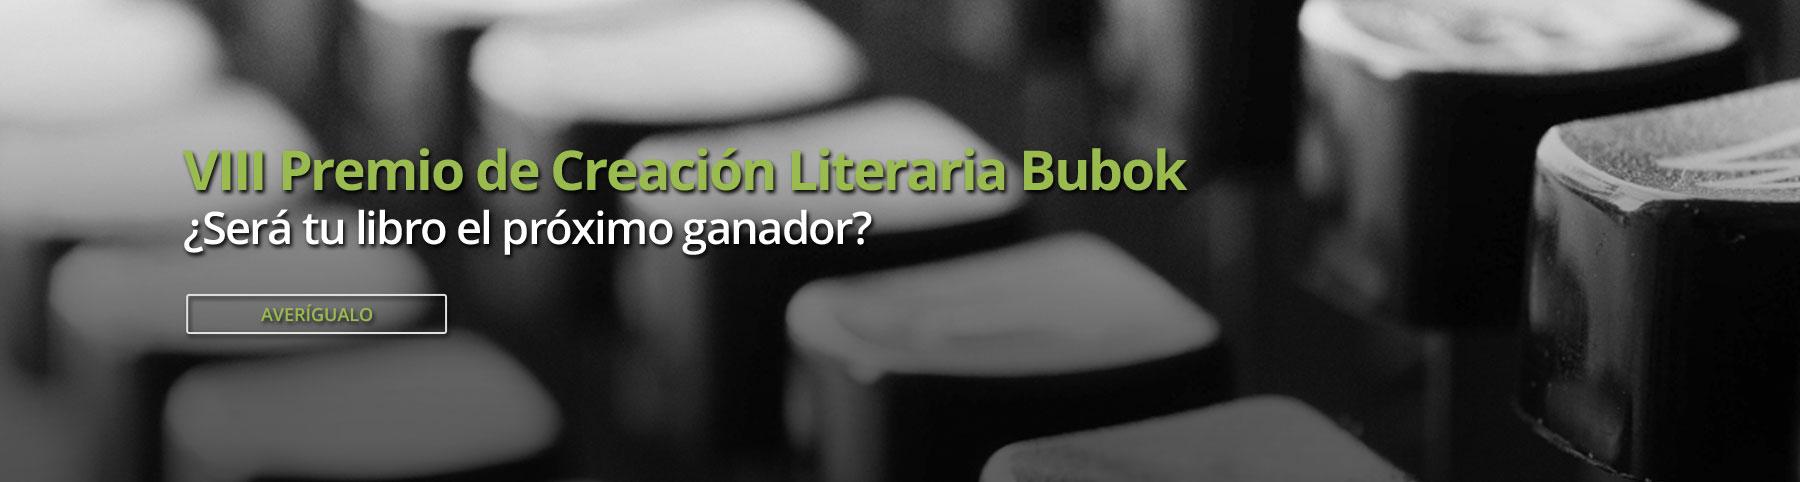 VIII premio literario Bubok